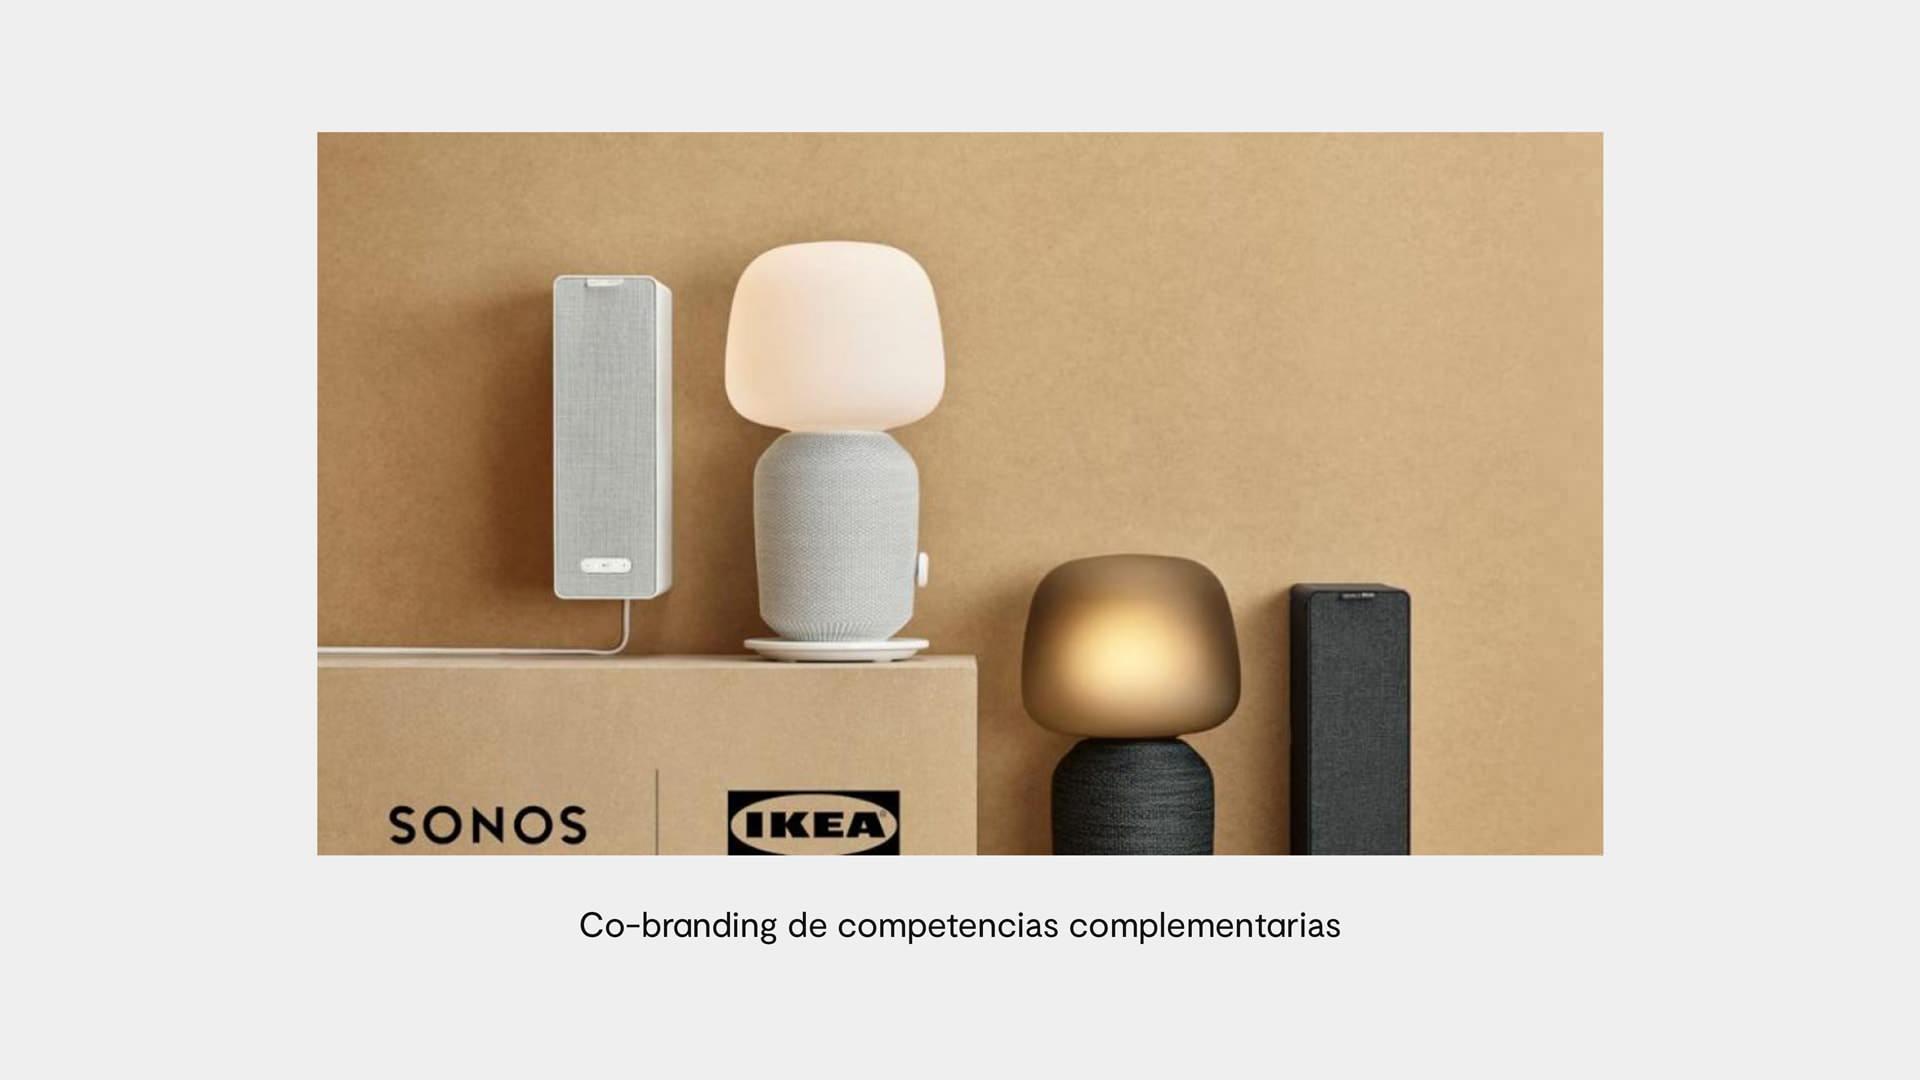 ejemplo cobranding entre Sonos e Ikea